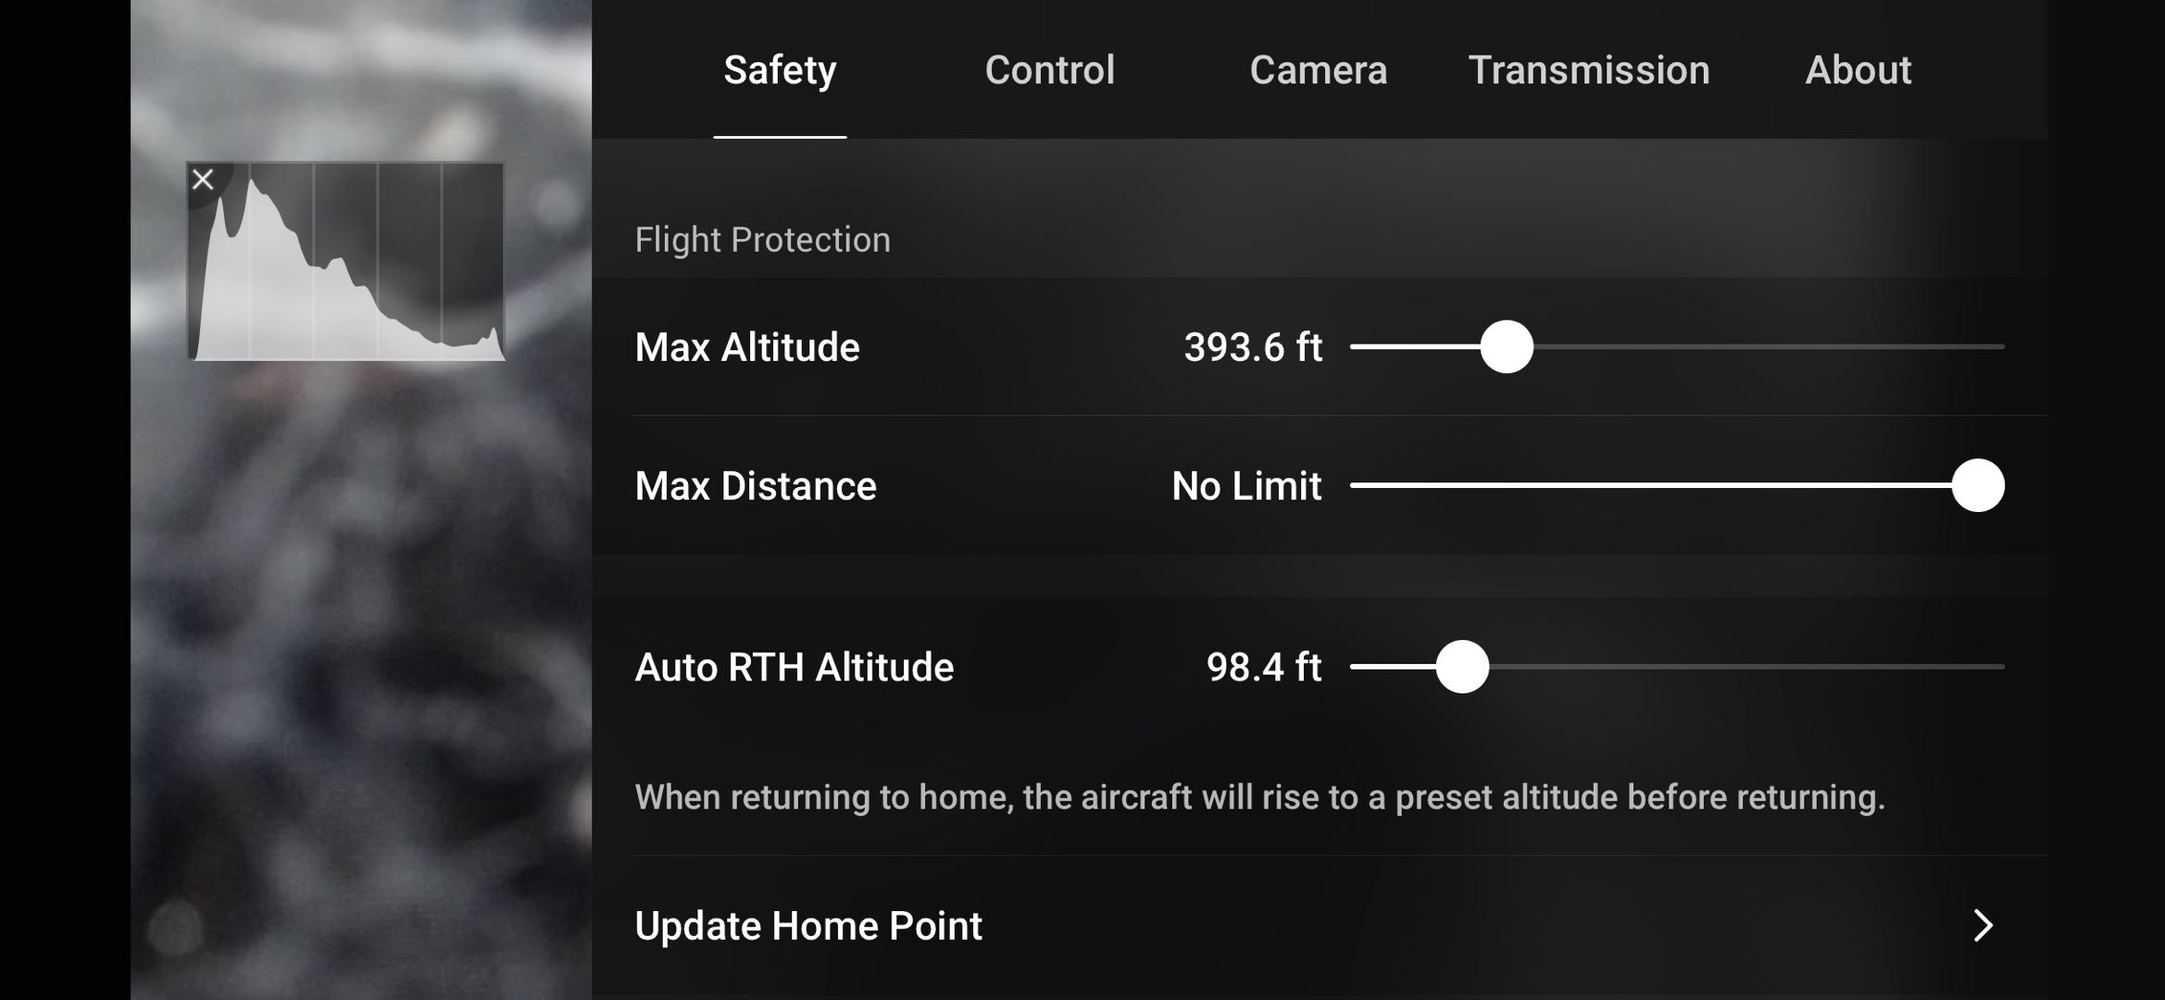 dji fly safety setting page